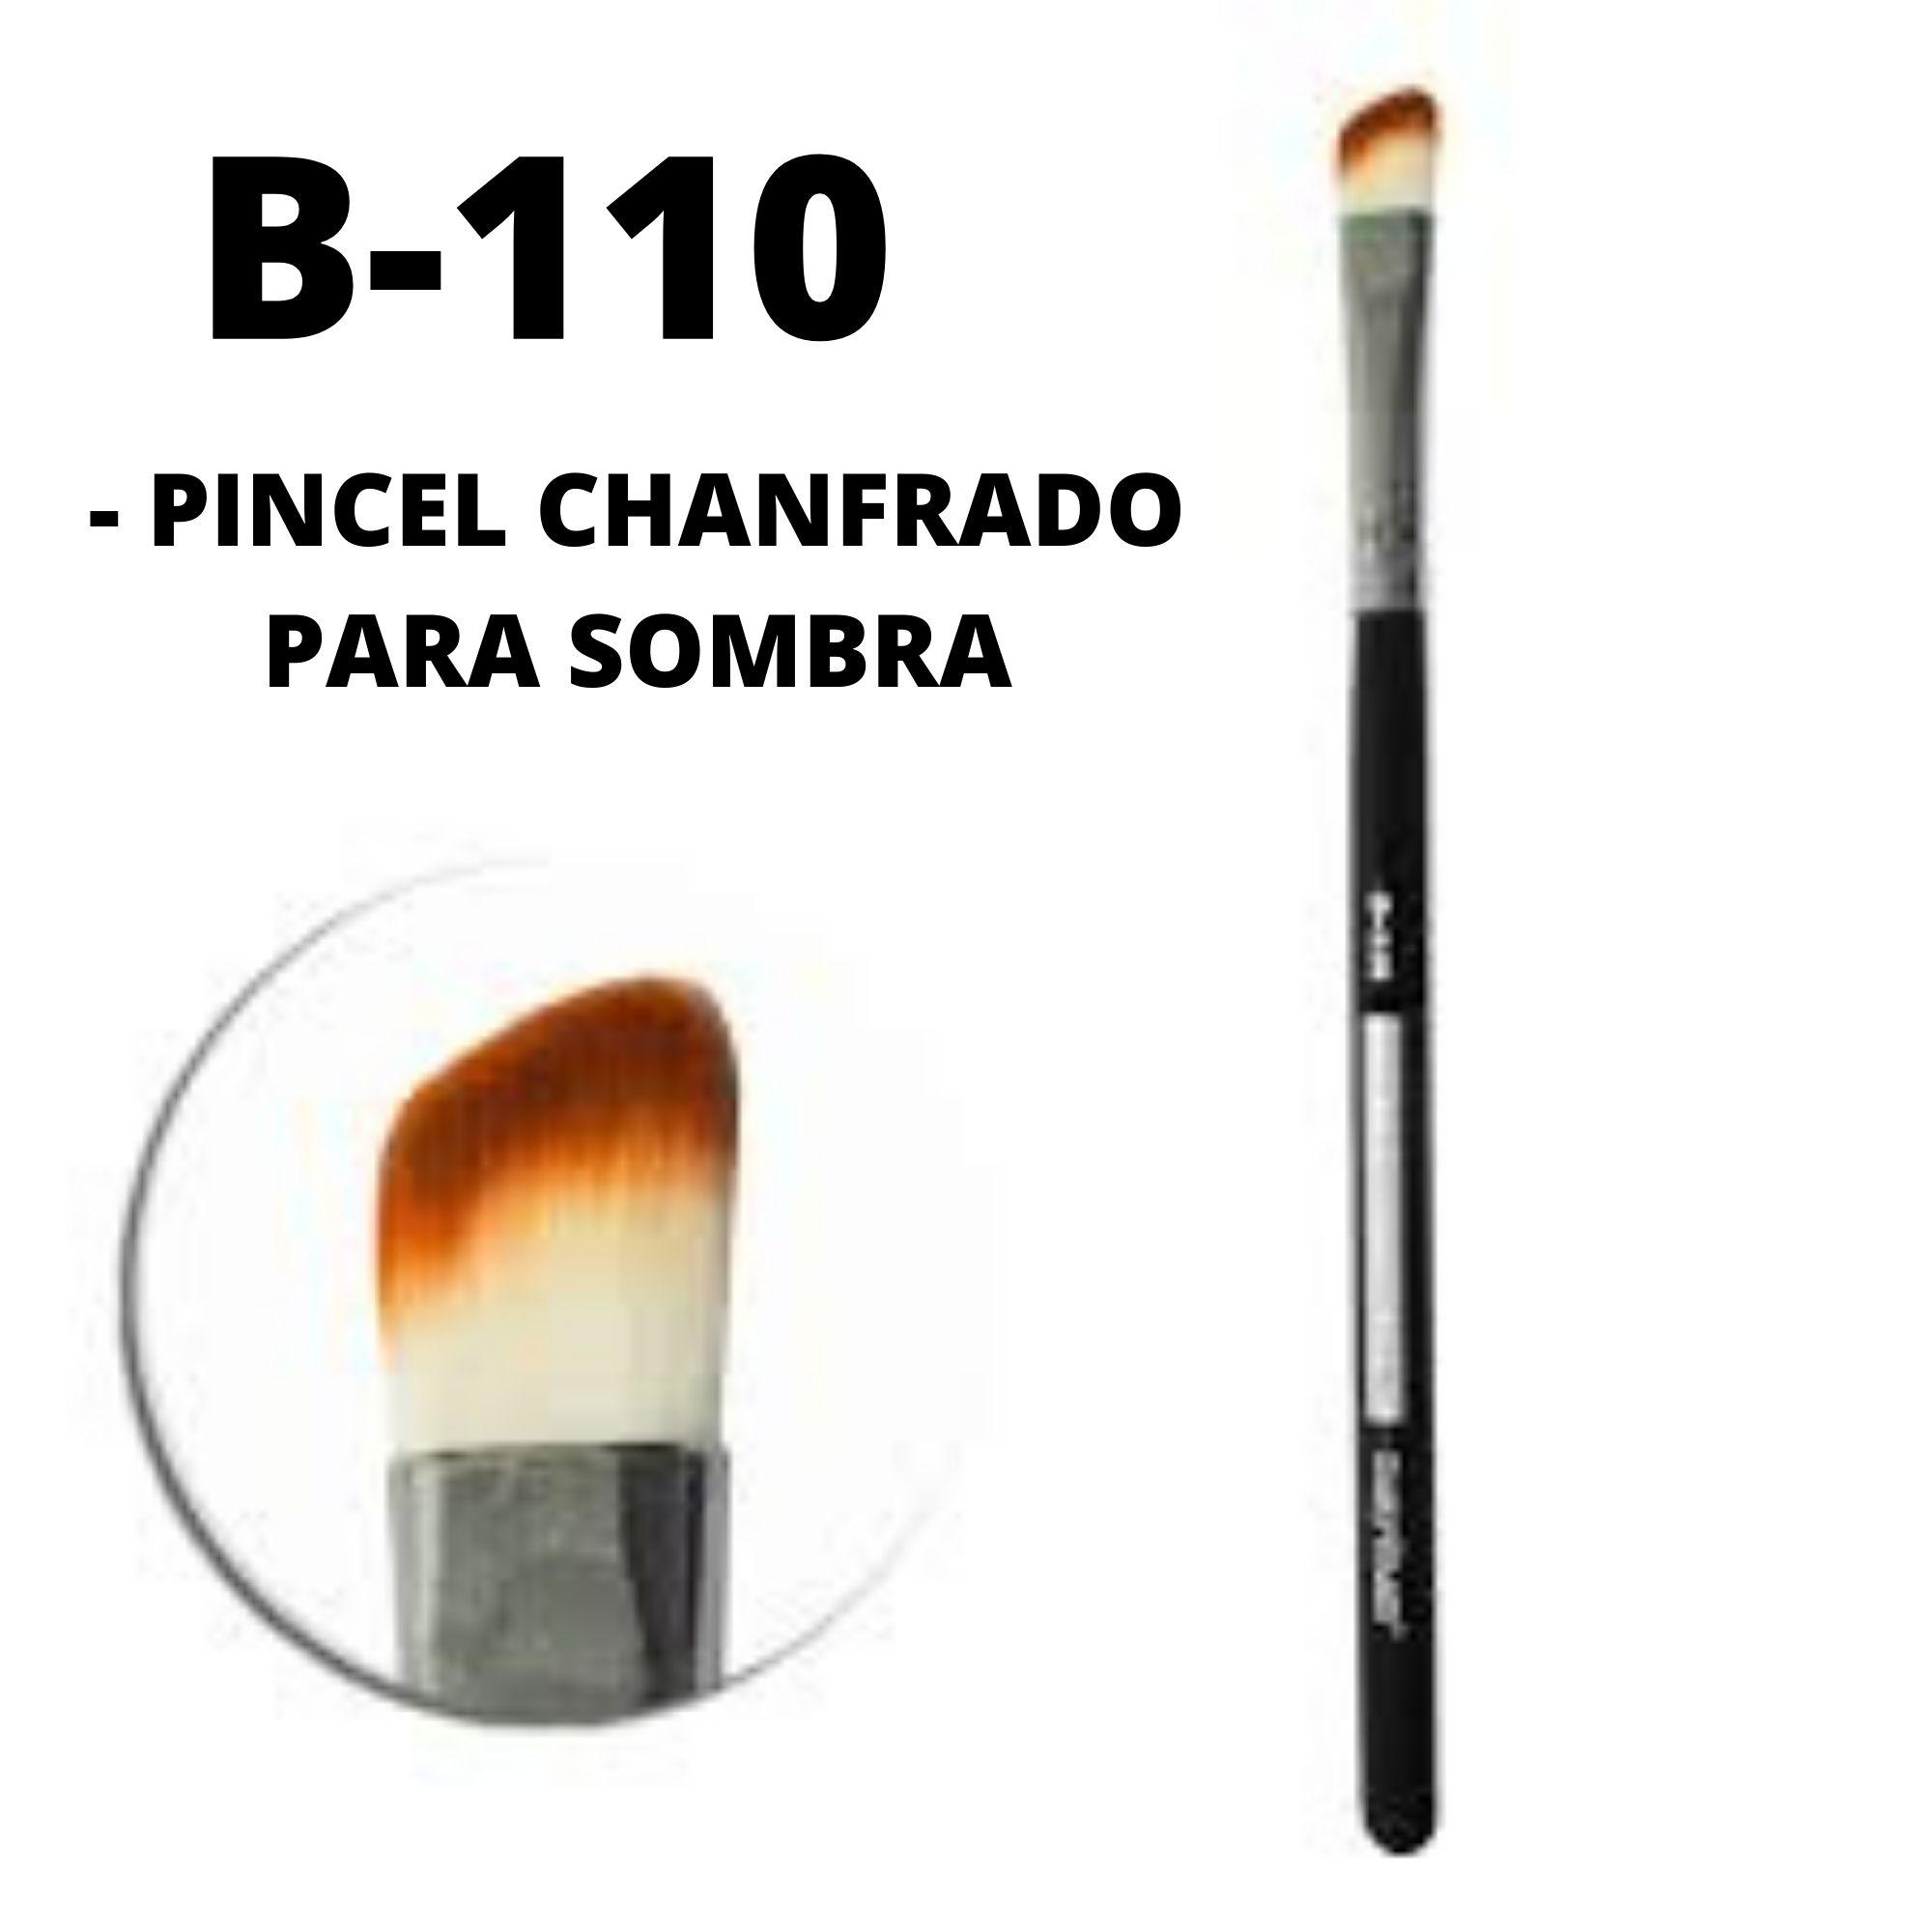 Pincel Chanfrado Para Sombra B110 Linha Black Profissional Macrilan